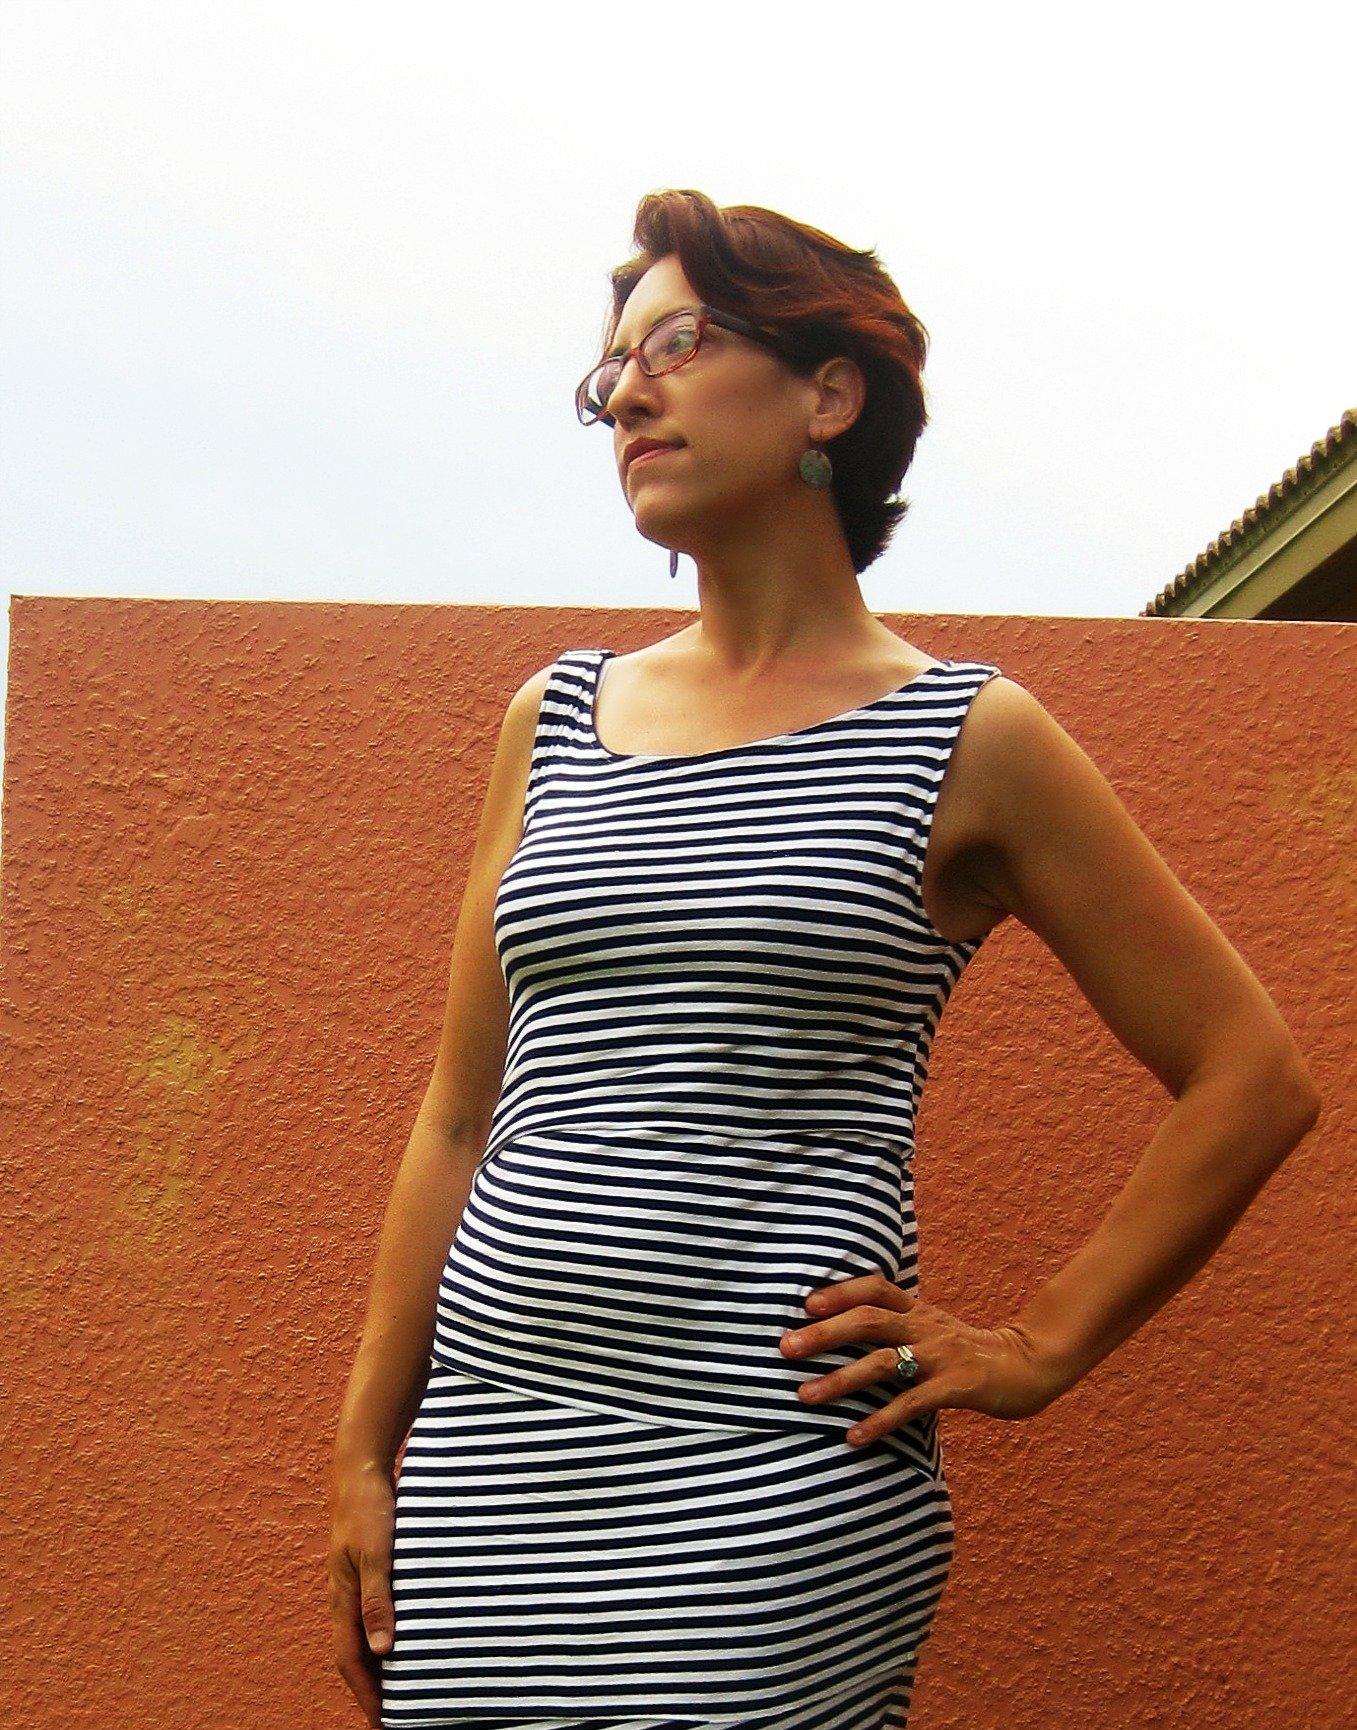 Marcy Tilton Shingle Dress, V8904 Sew Pomona